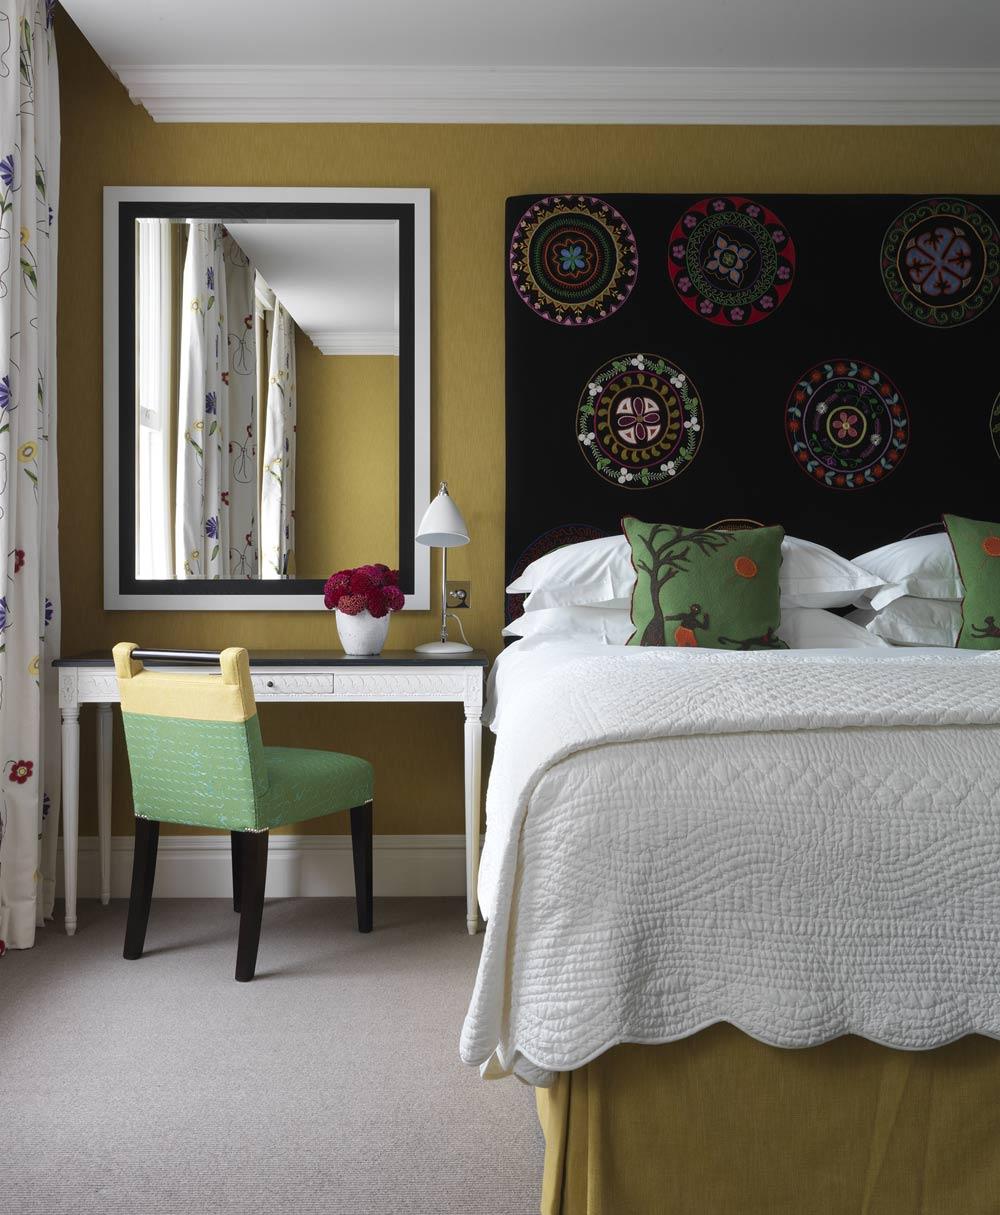 Dorset Square Guest room atDorset Square HotelLondonUnited Kingdom